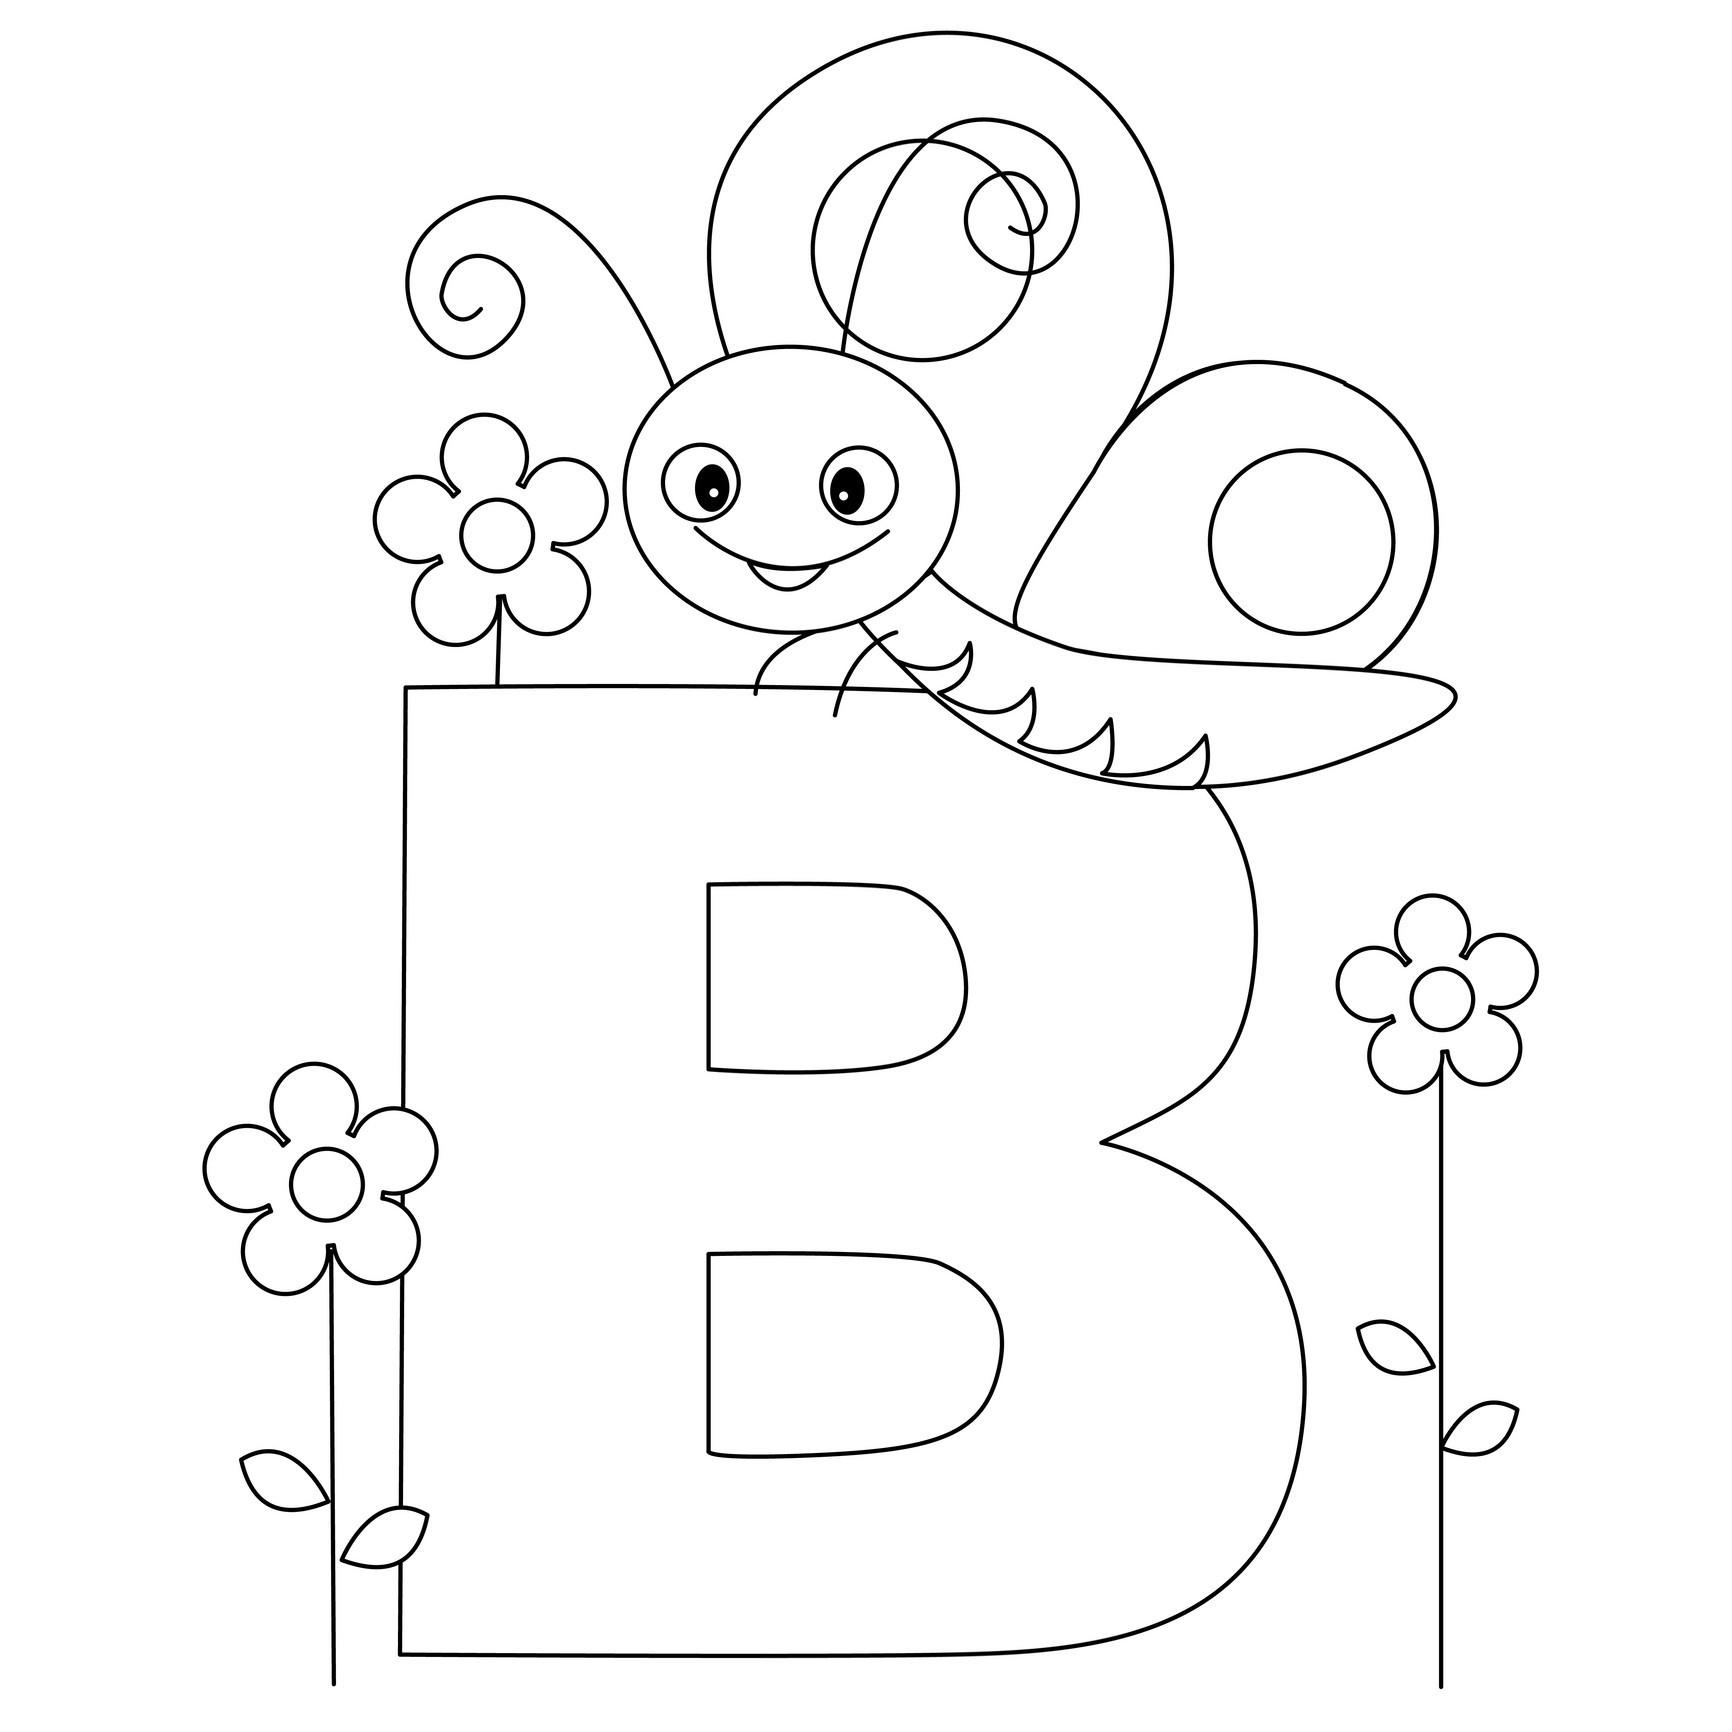 letter a coloring page alphabet coloring pages letters u z page letter coloring a